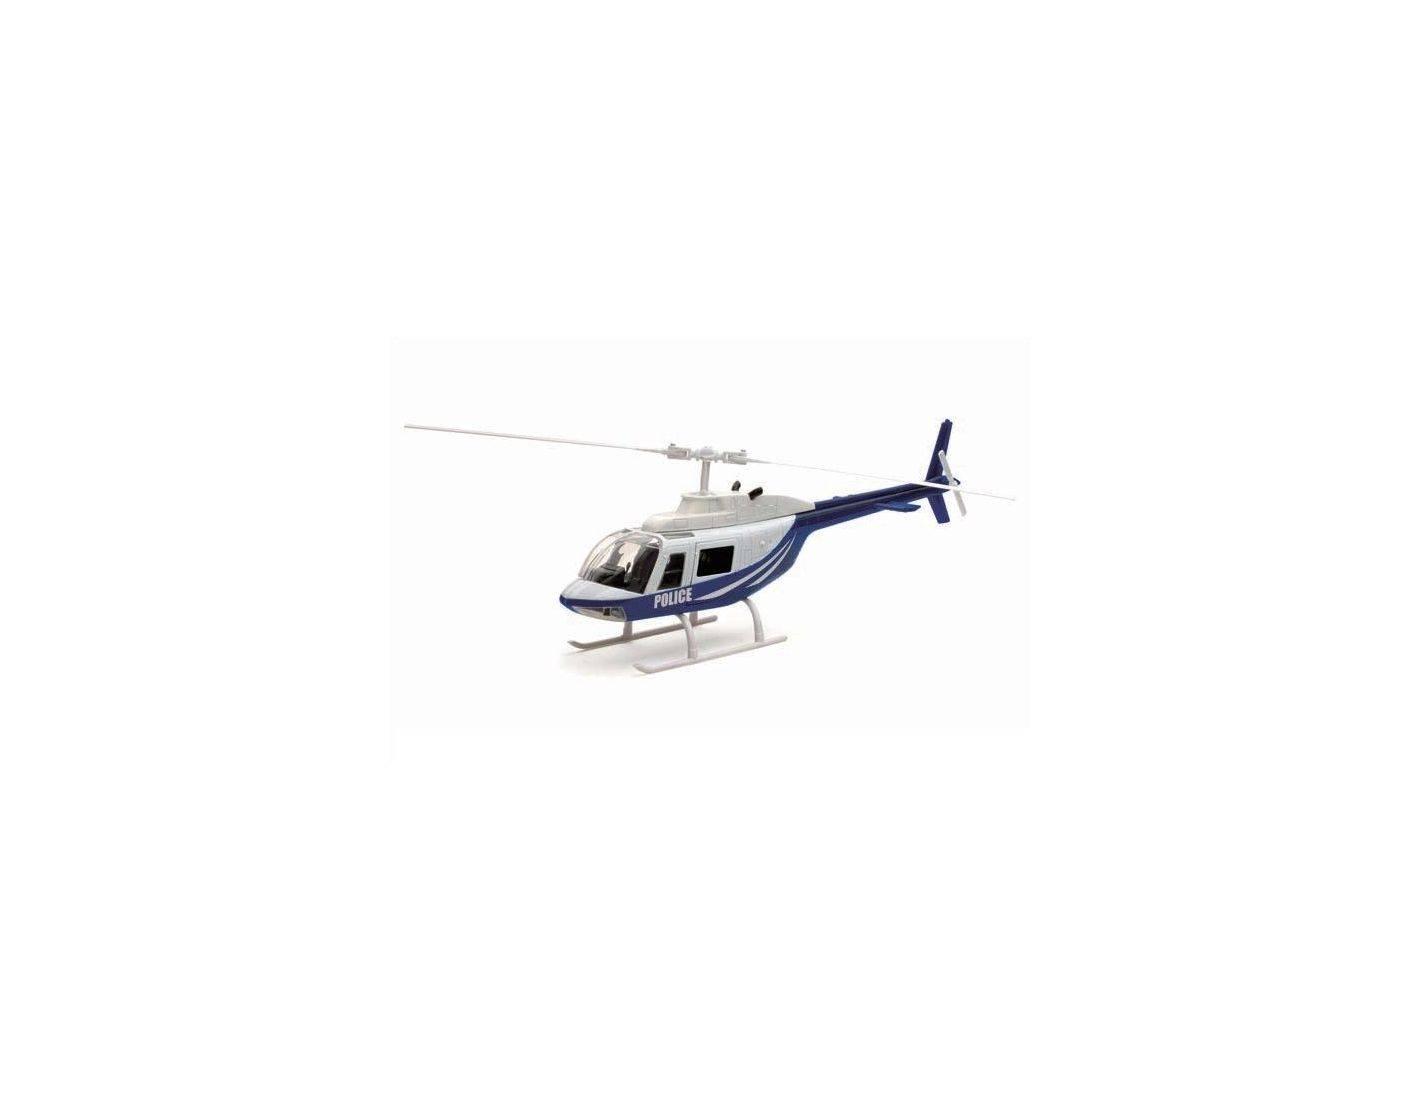 Elicottero Dat3 : New ray ny elicottero bell police modellino